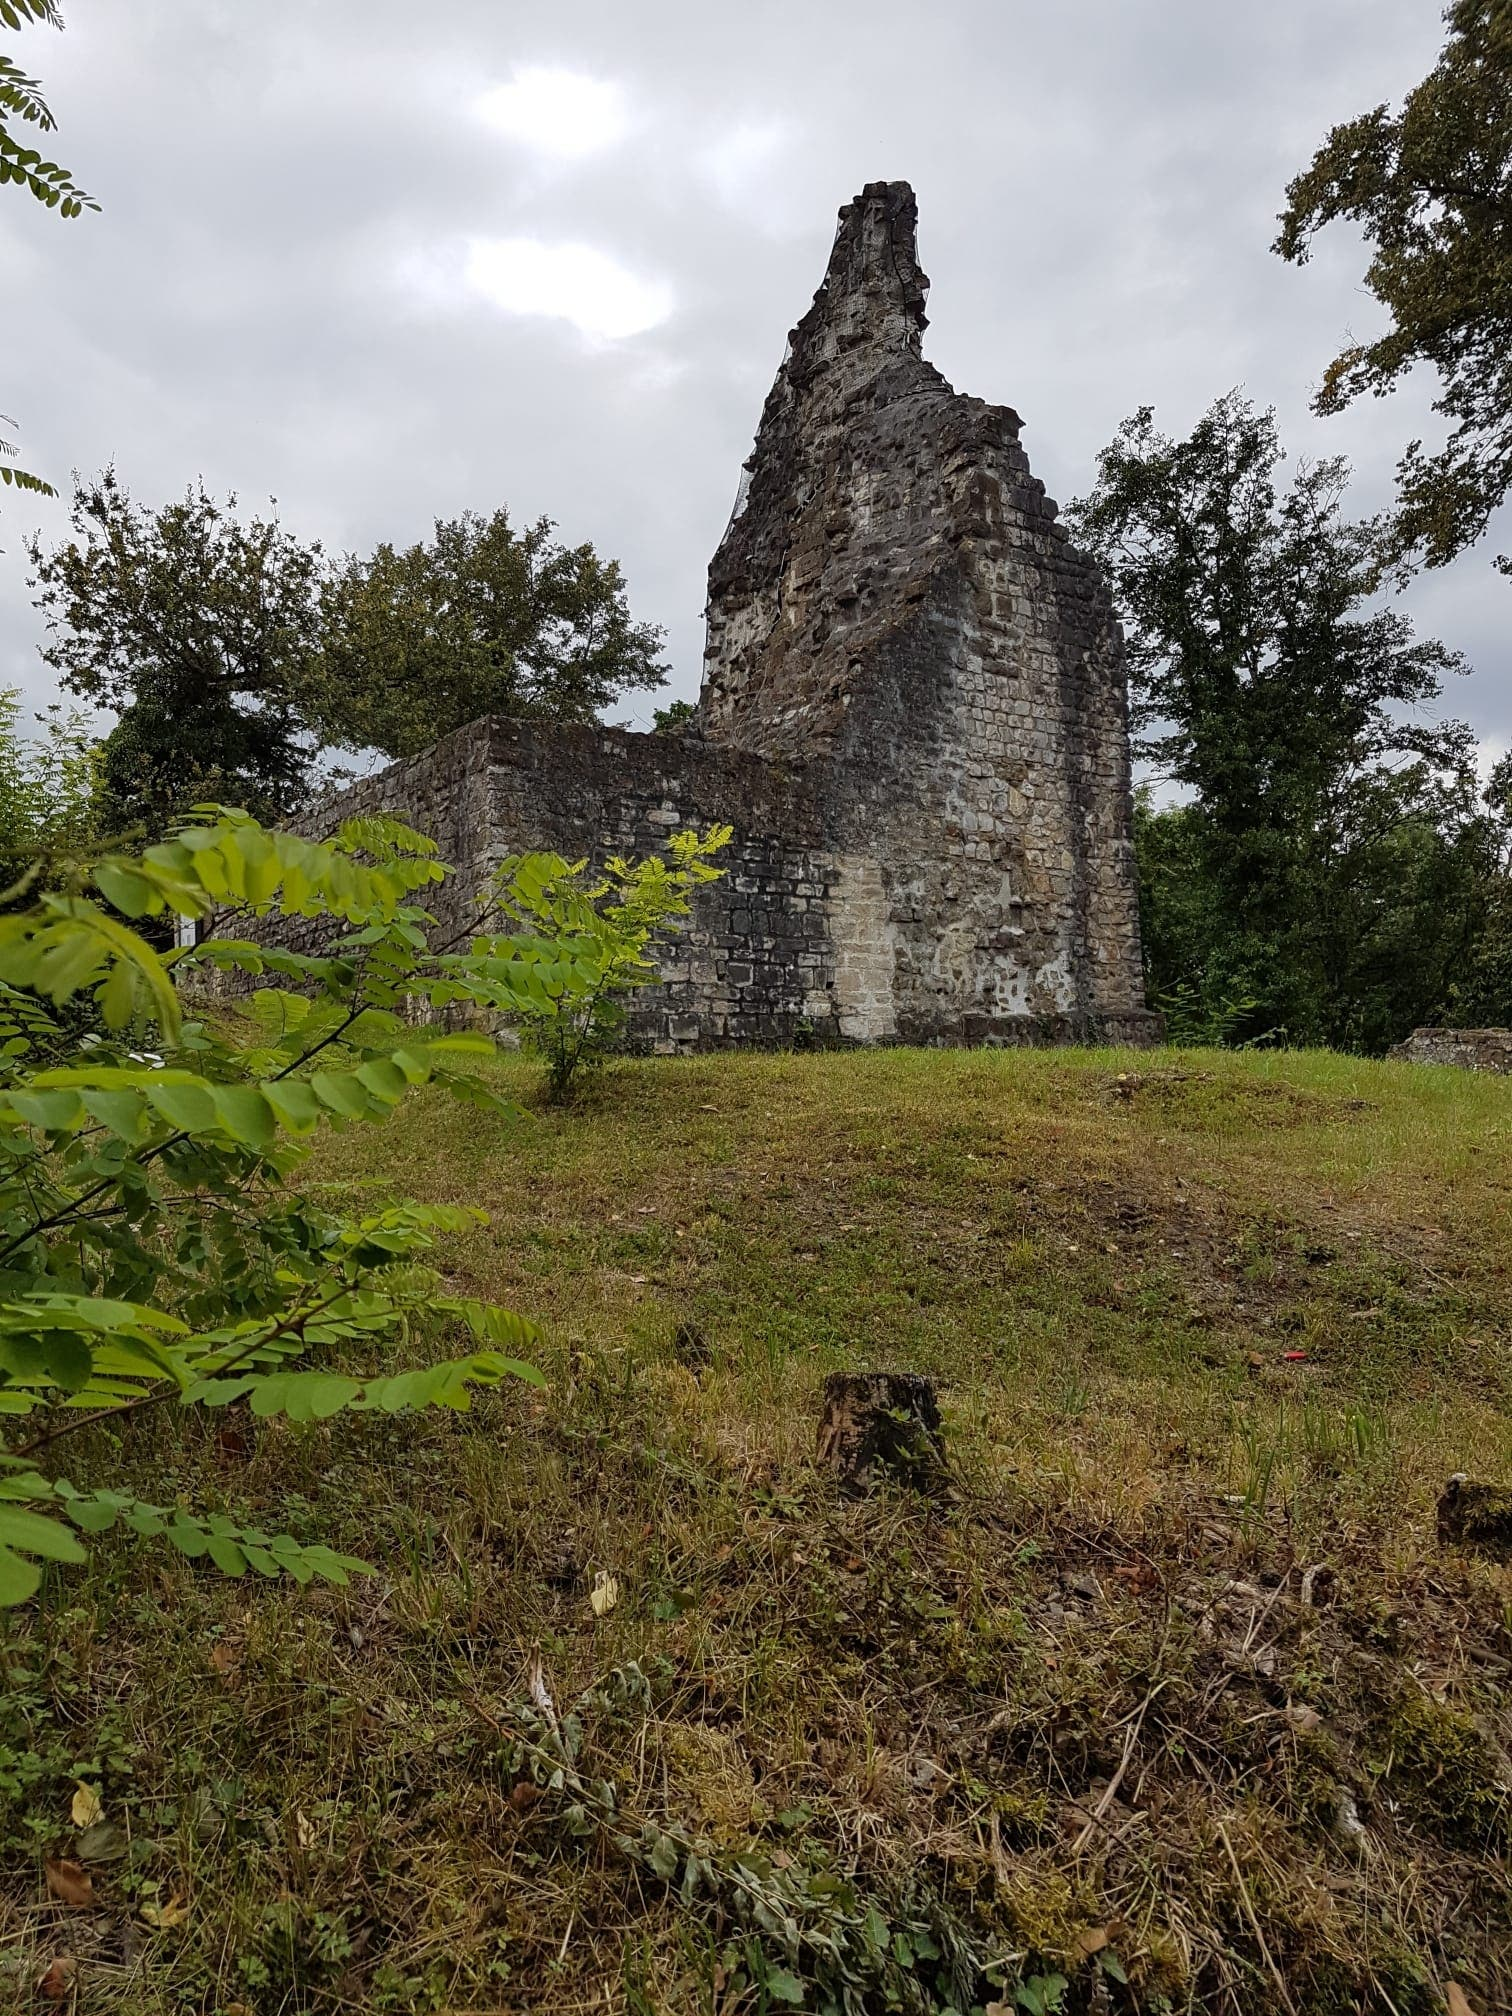 Die Ruine in Tegerfelden.